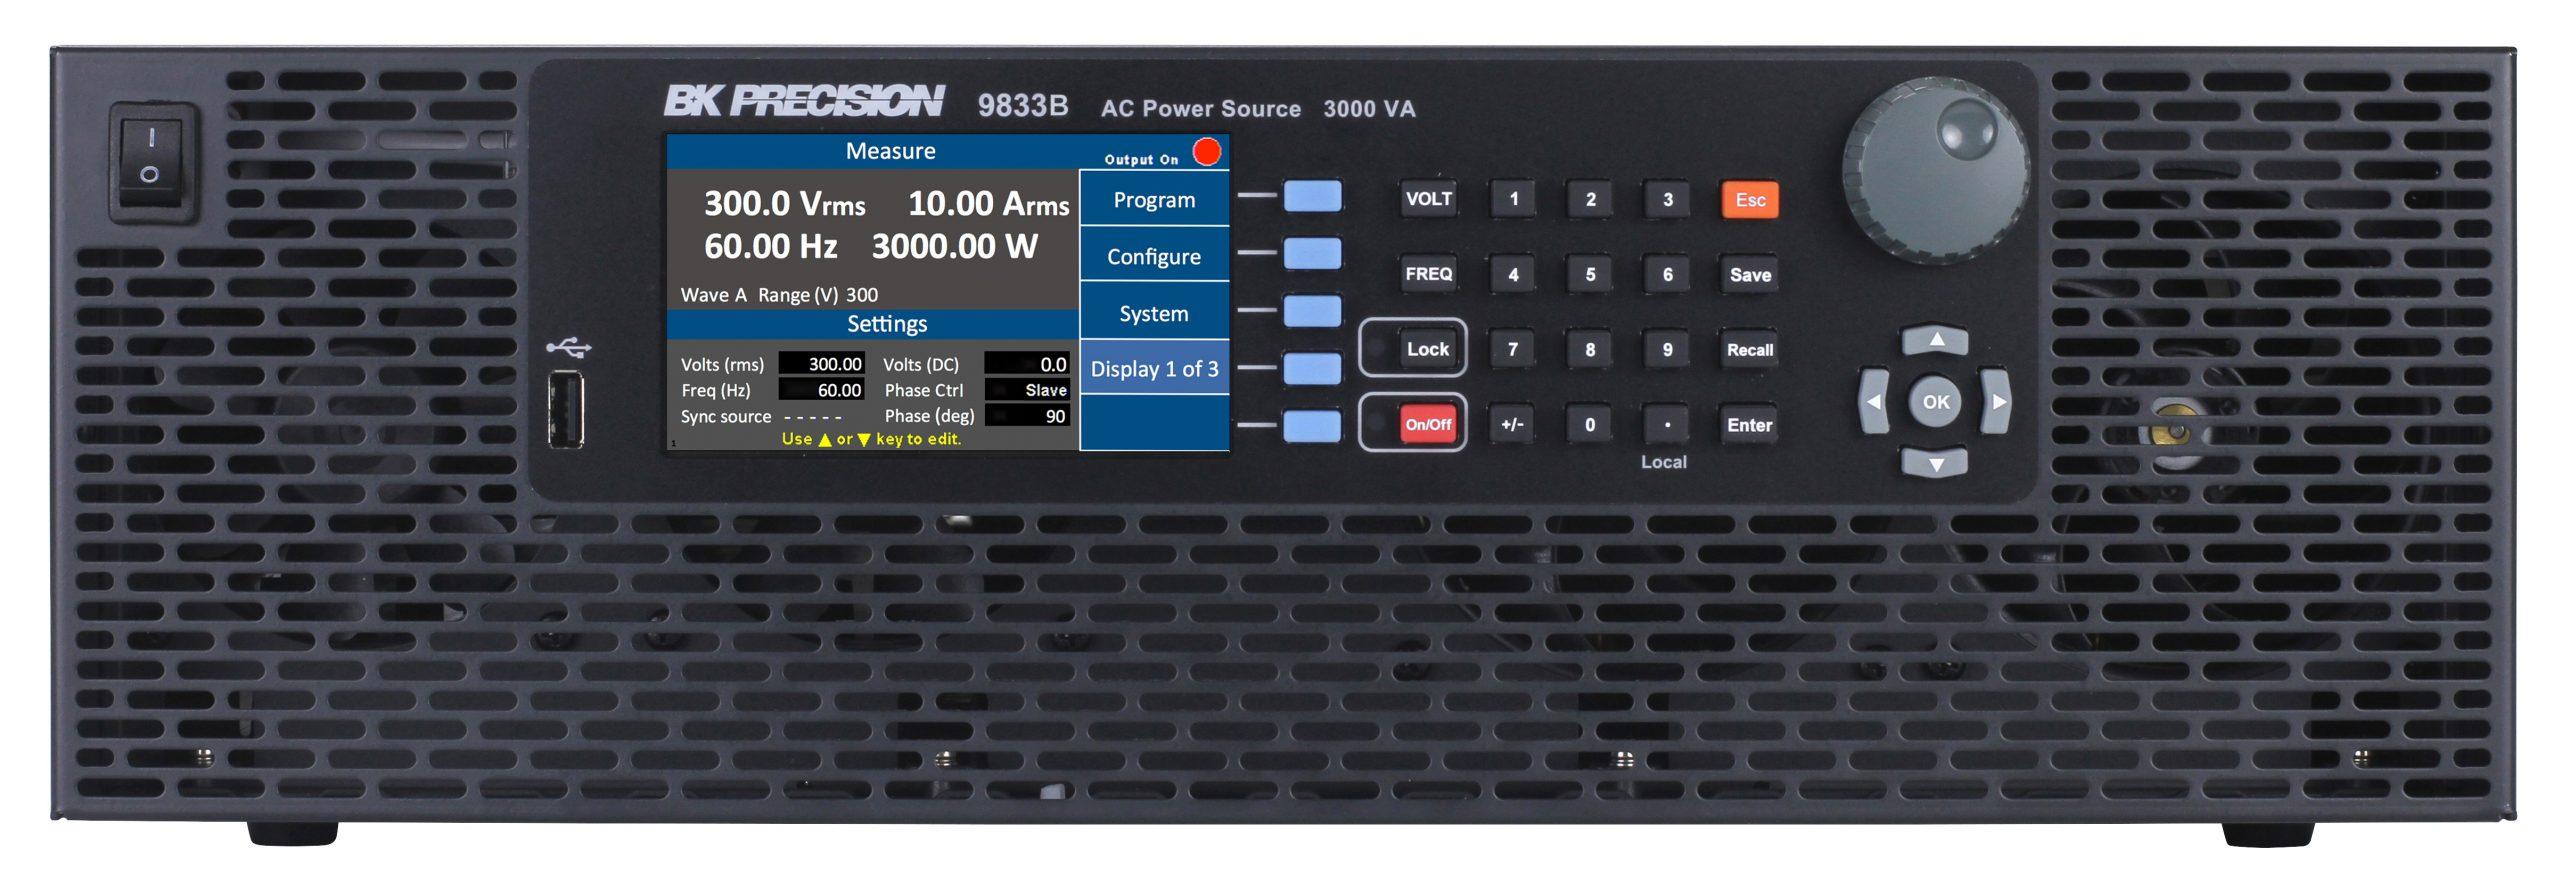 B&K Precision 9833B AC Power Source